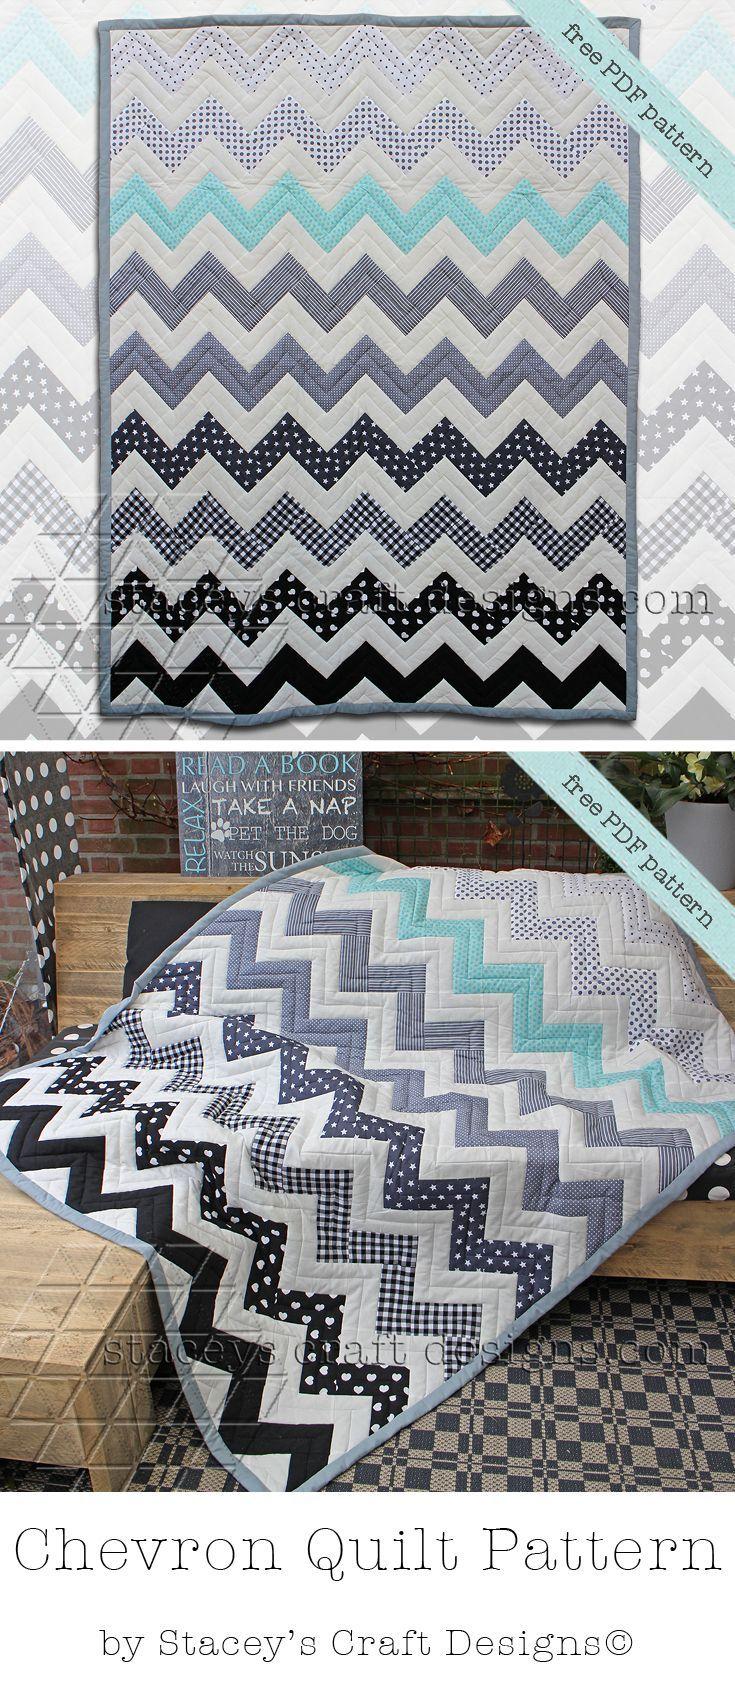 17 Best ideas about Chevron Quilt Pattern on Pinterest Chevron quilt, Easy quilt patterns and ...